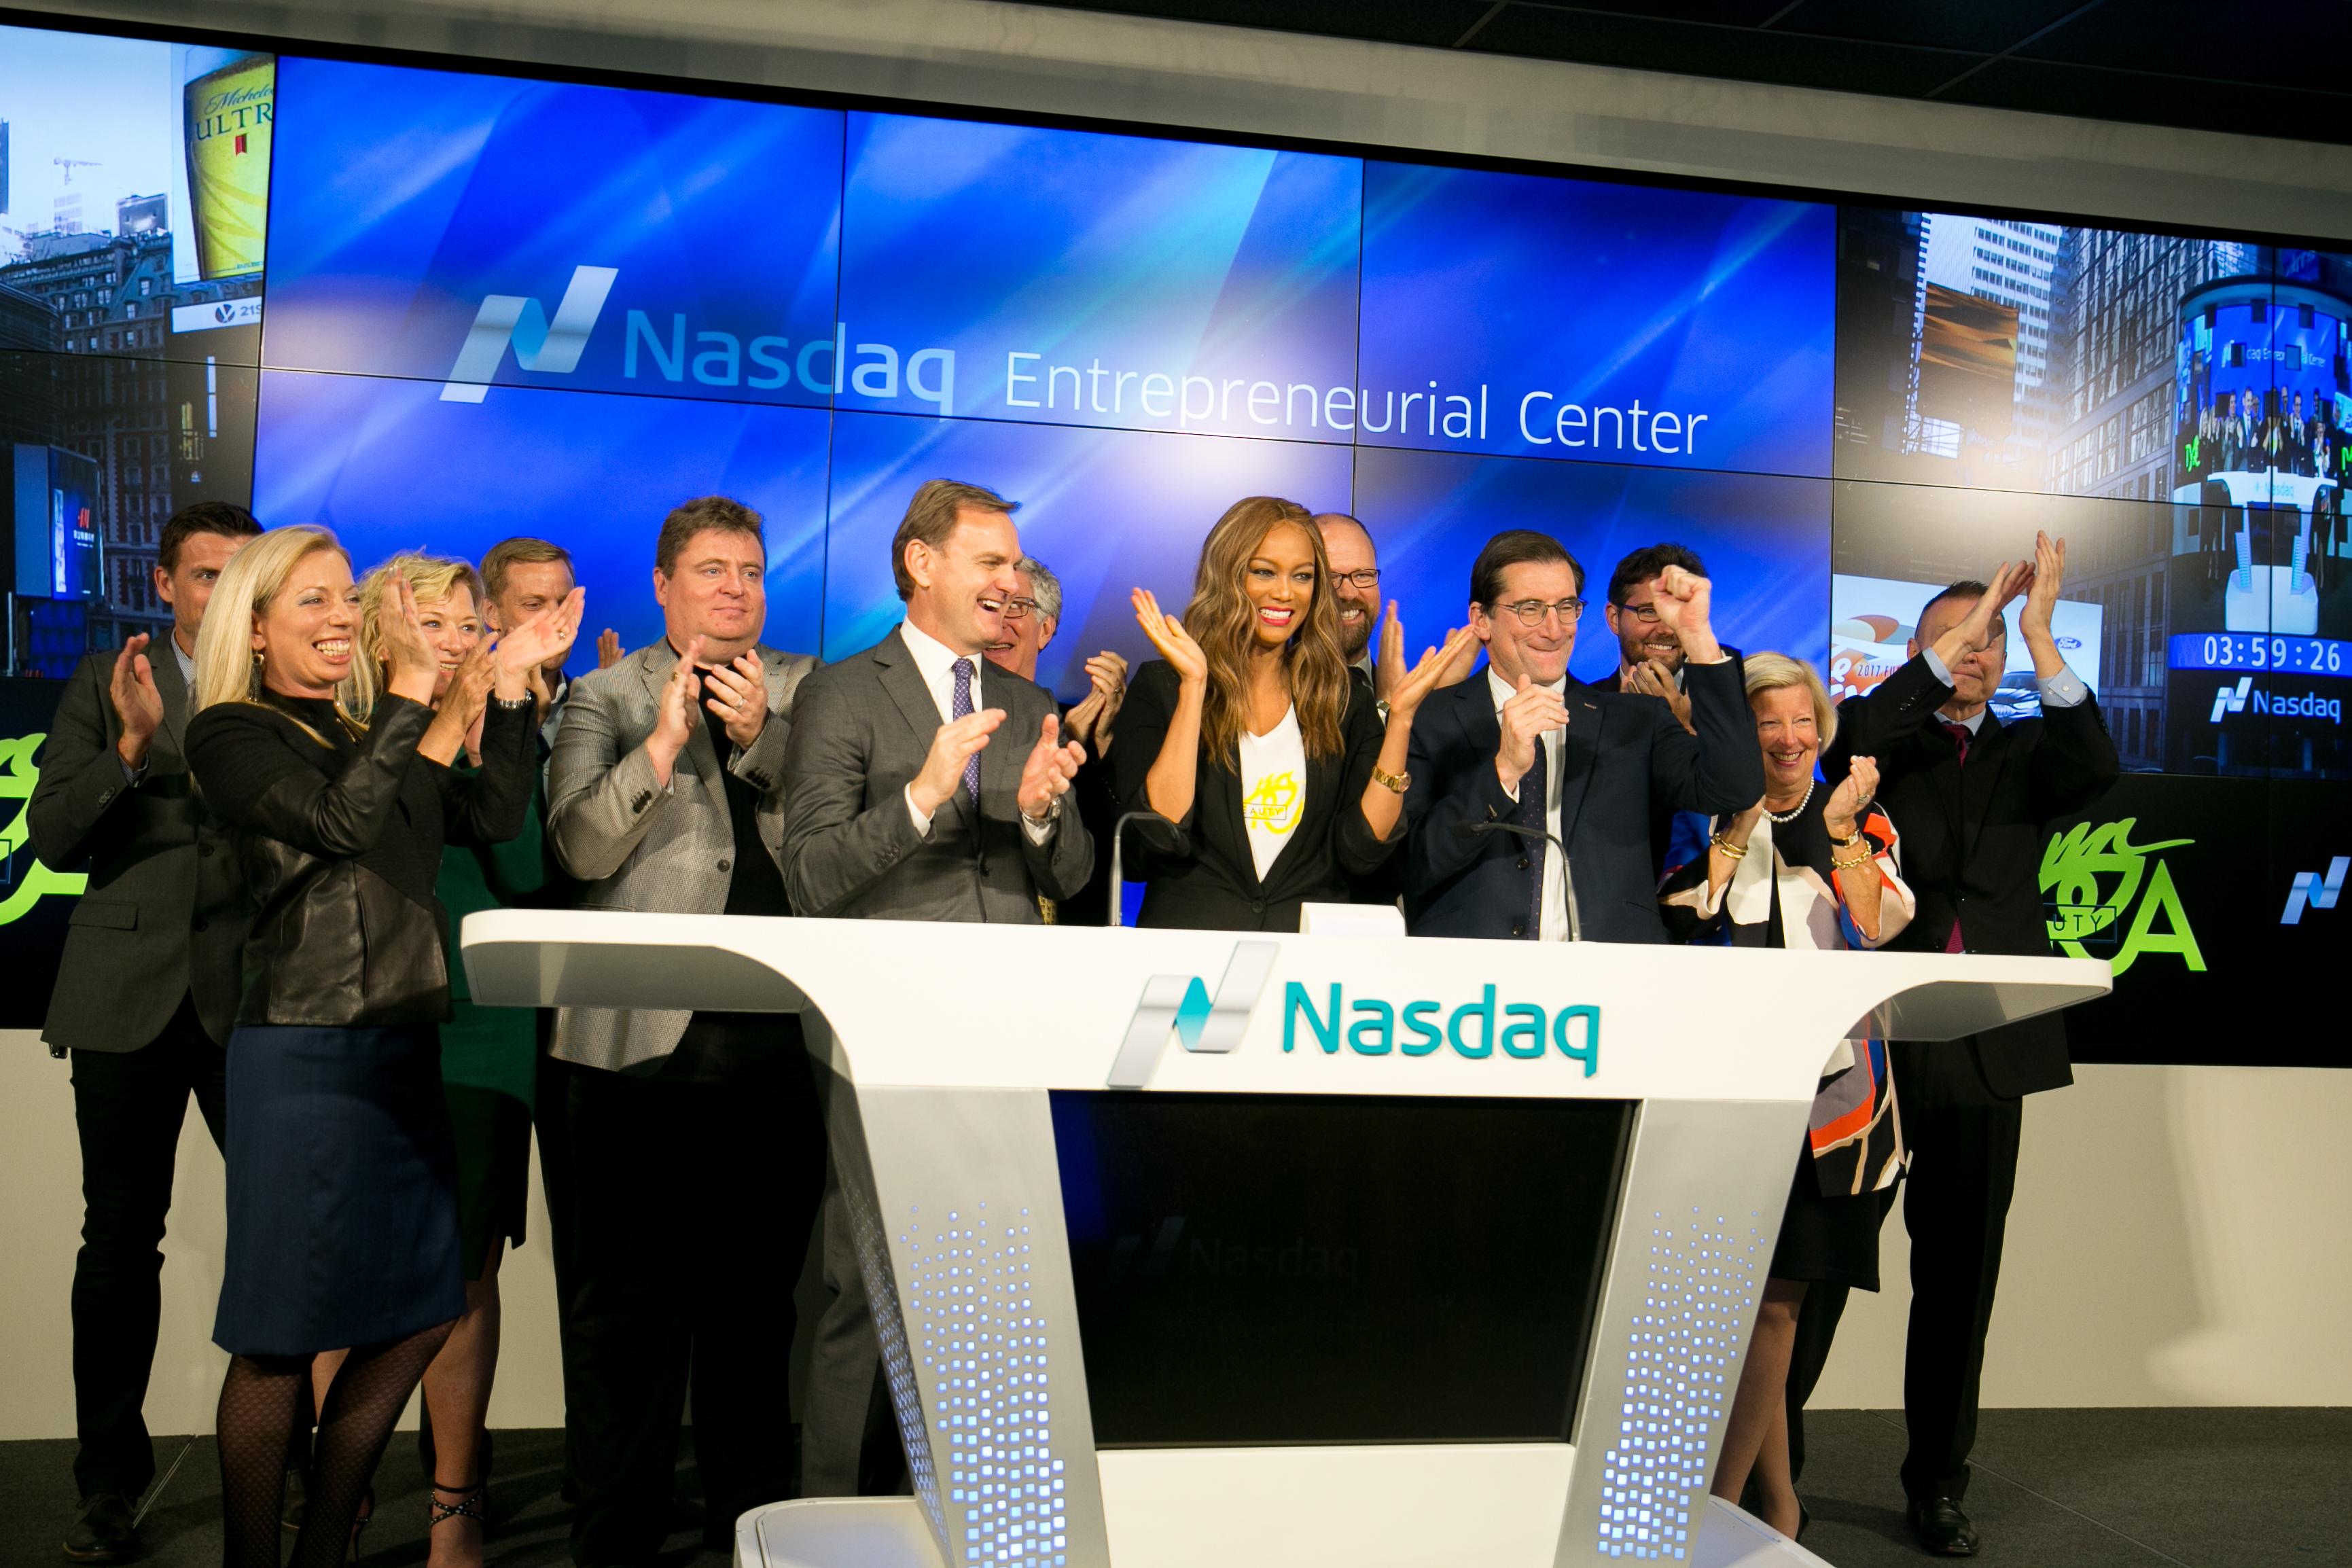 Tyra Banks, center, waits to ring the markets closing bell at NASDAQ's Entrepreneurial Center in San Francisco.